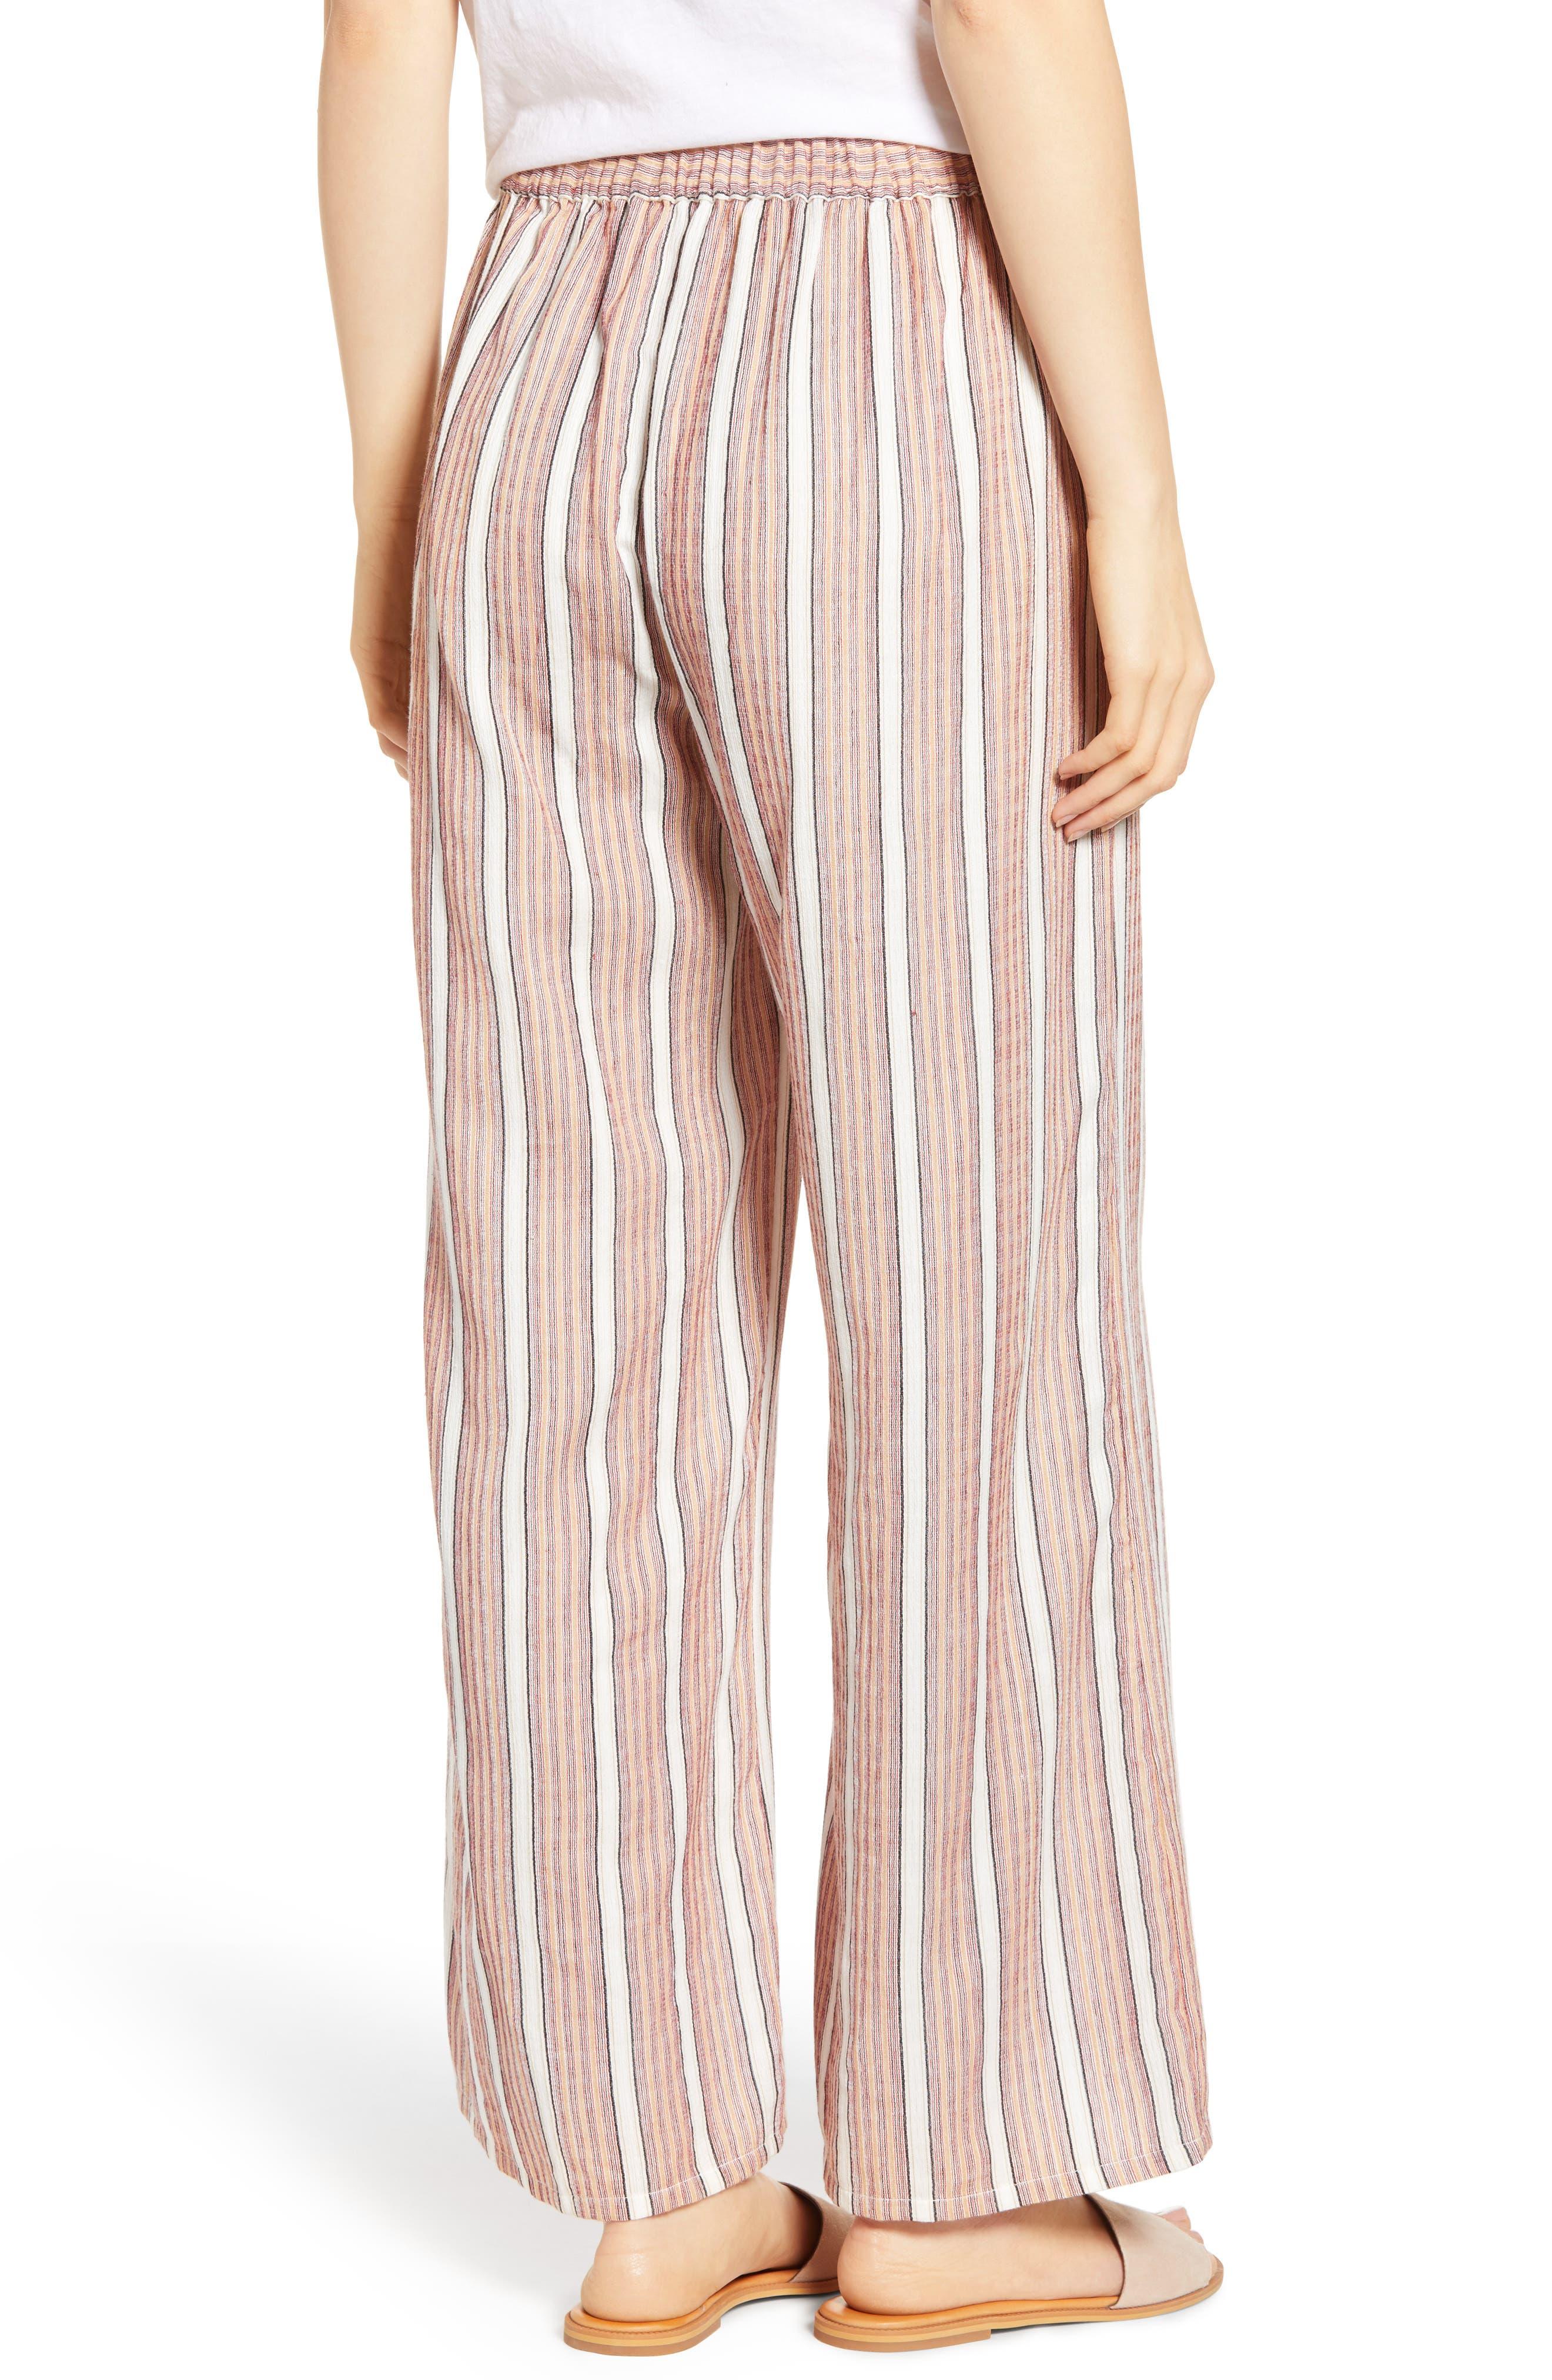 Midnight Avenue Stripe Pants,                             Alternate thumbnail 2, color,                             AMERICAN BEAUTY MULTI STRIPES